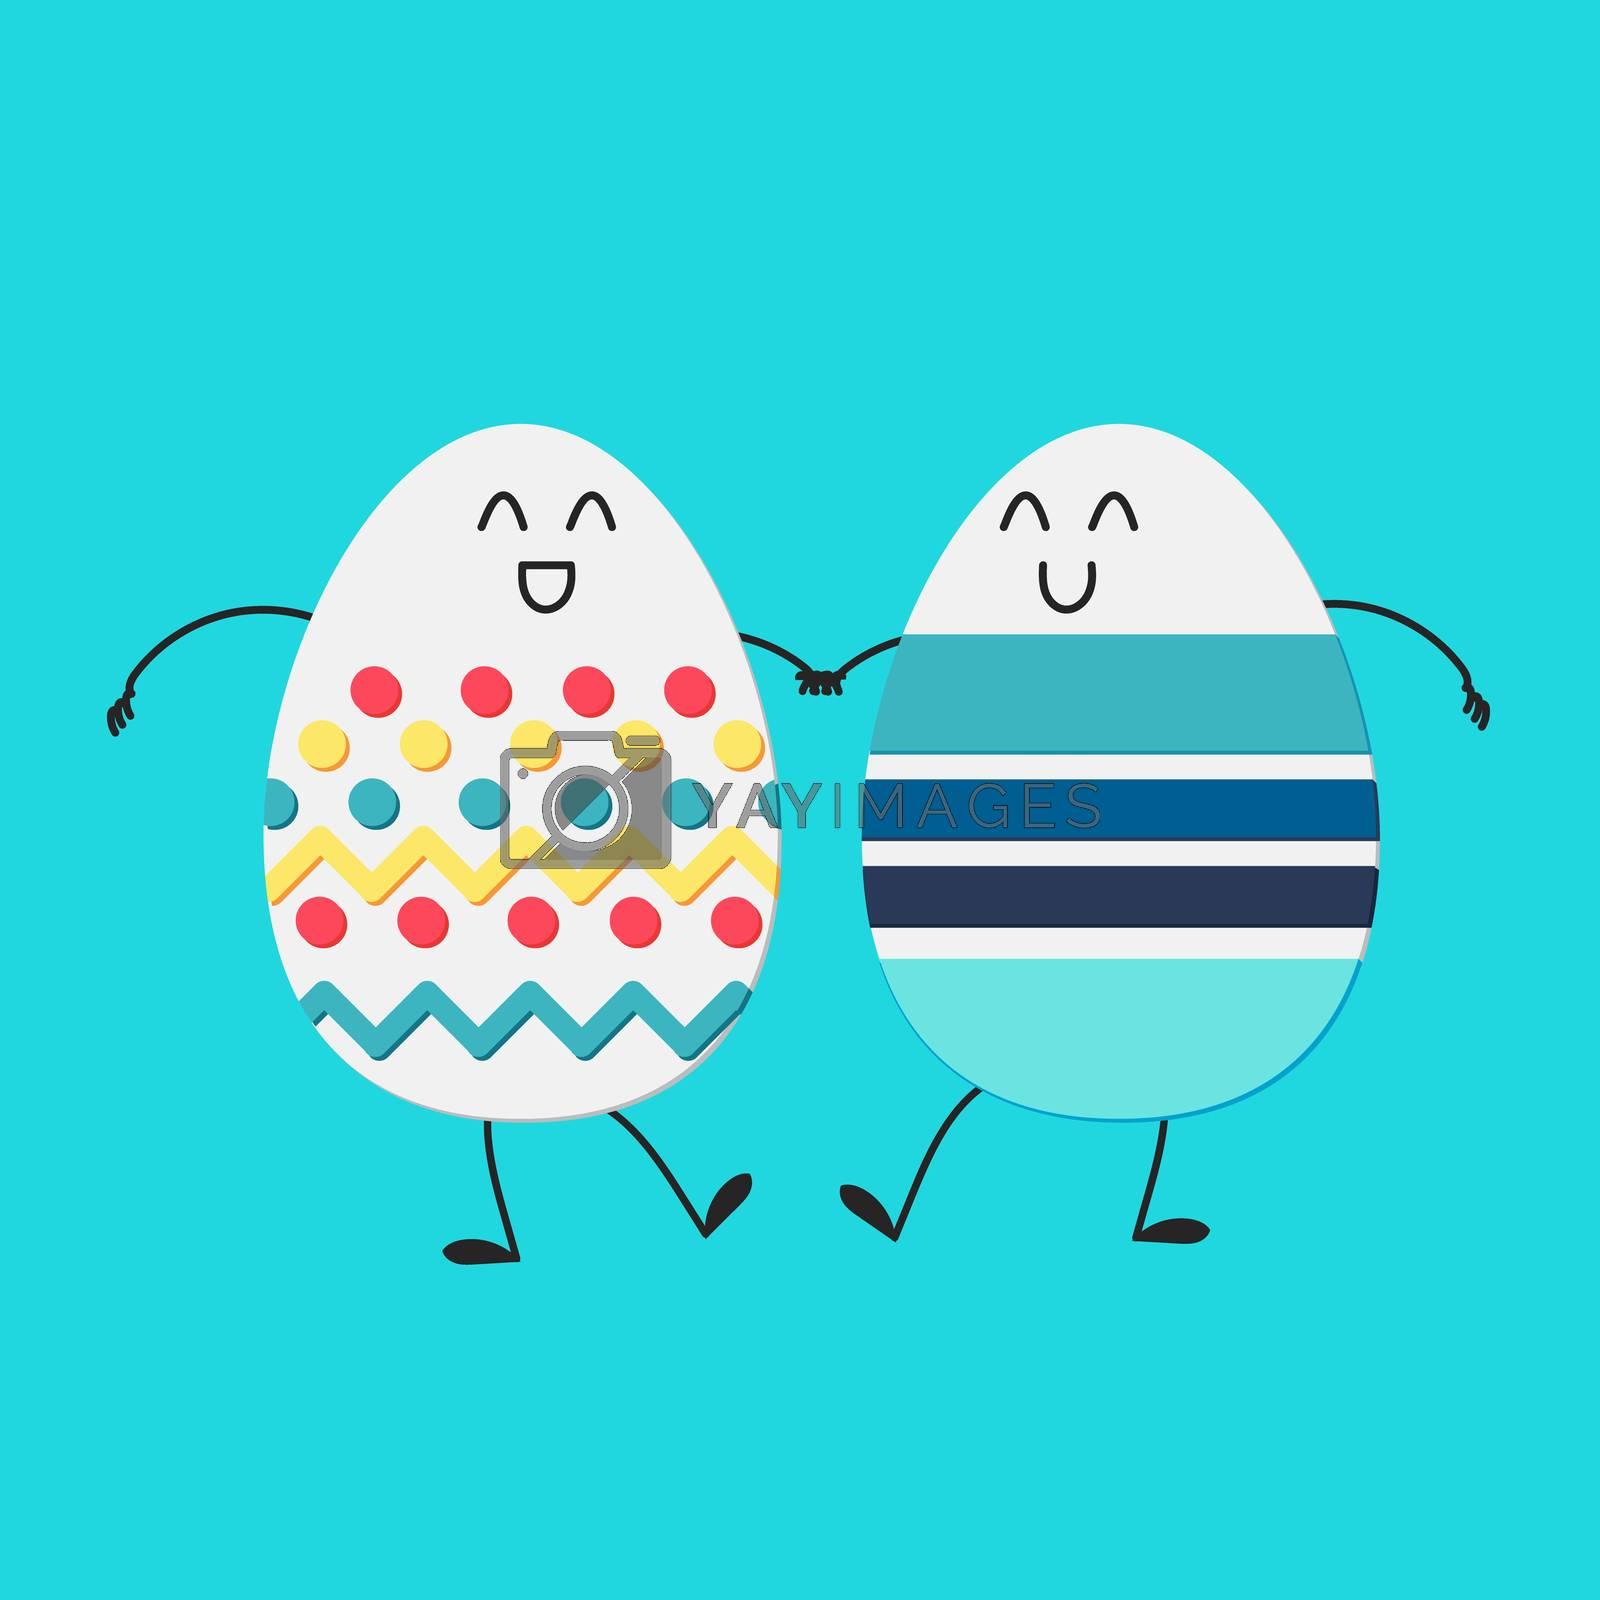 Happy easter with happy dancing egg. Vector